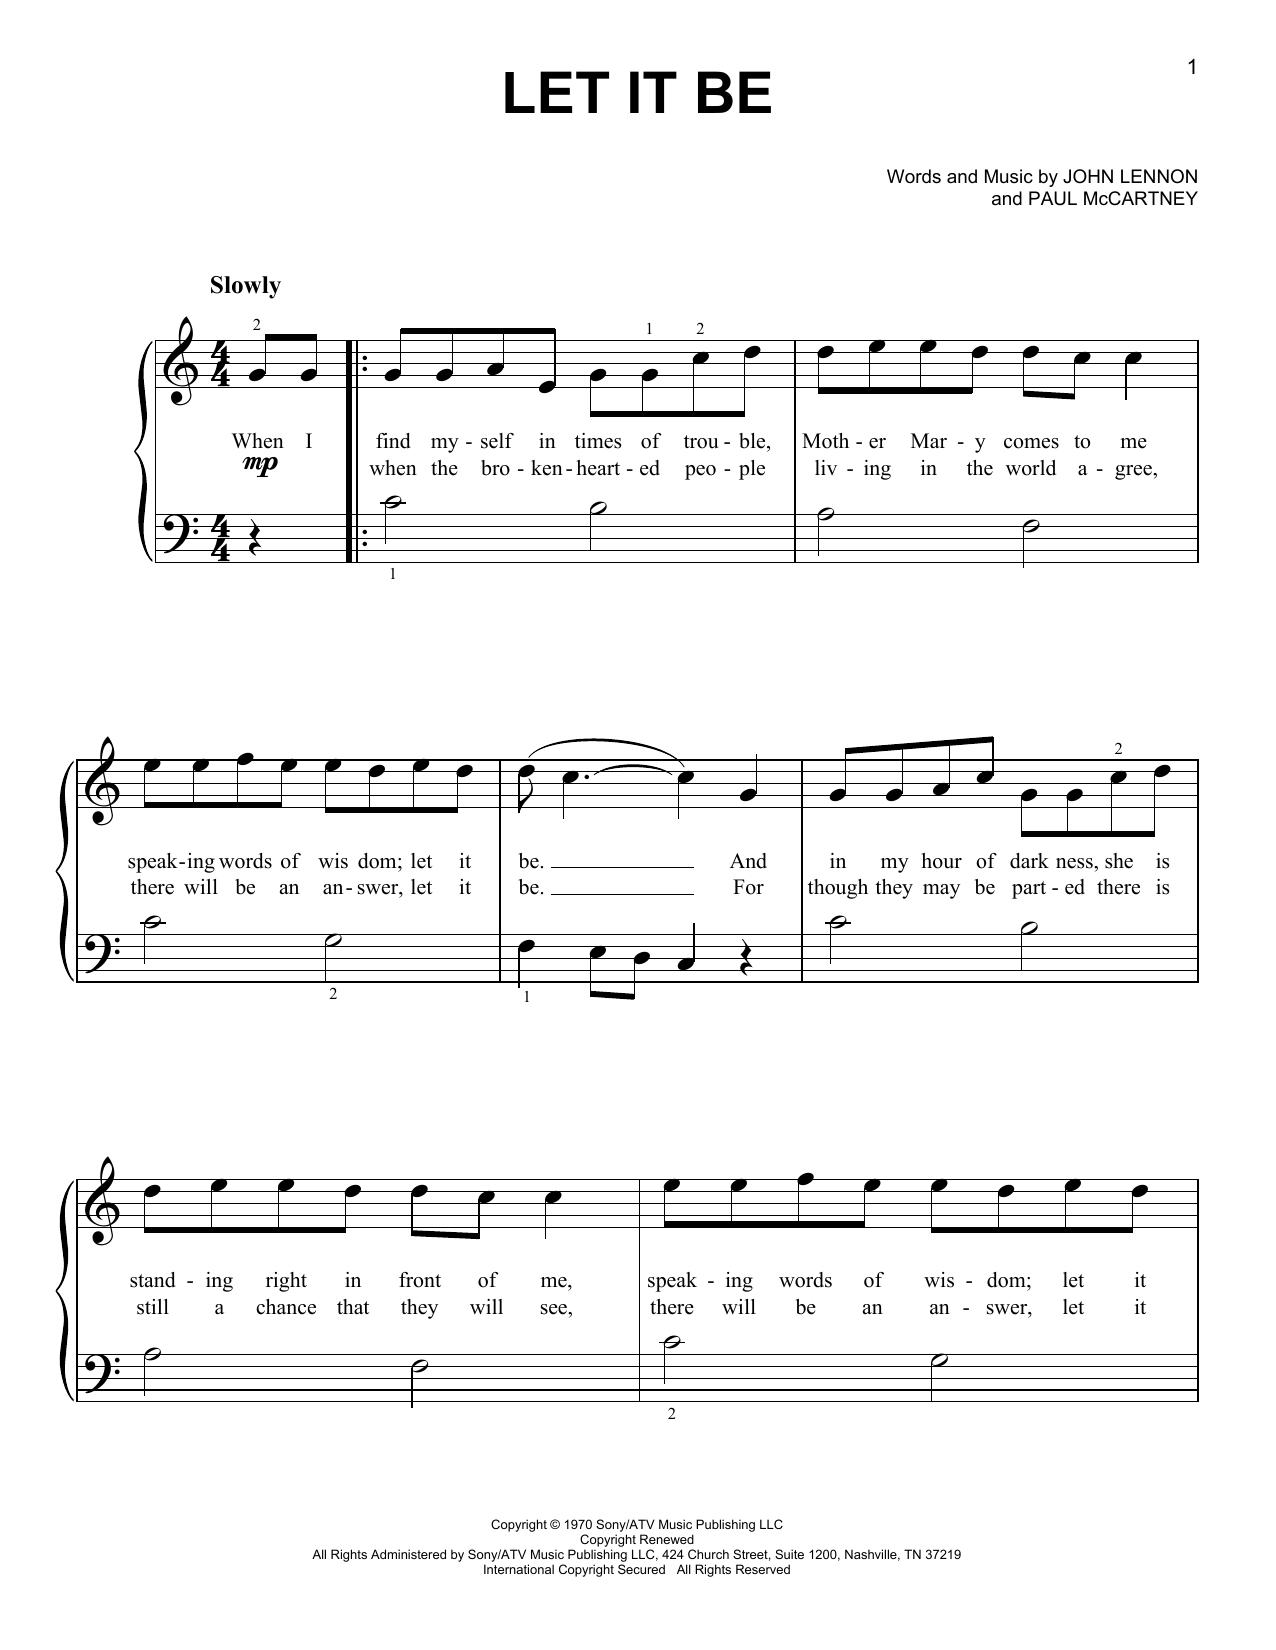 Beatles Beginner Piano Sheet Music Free